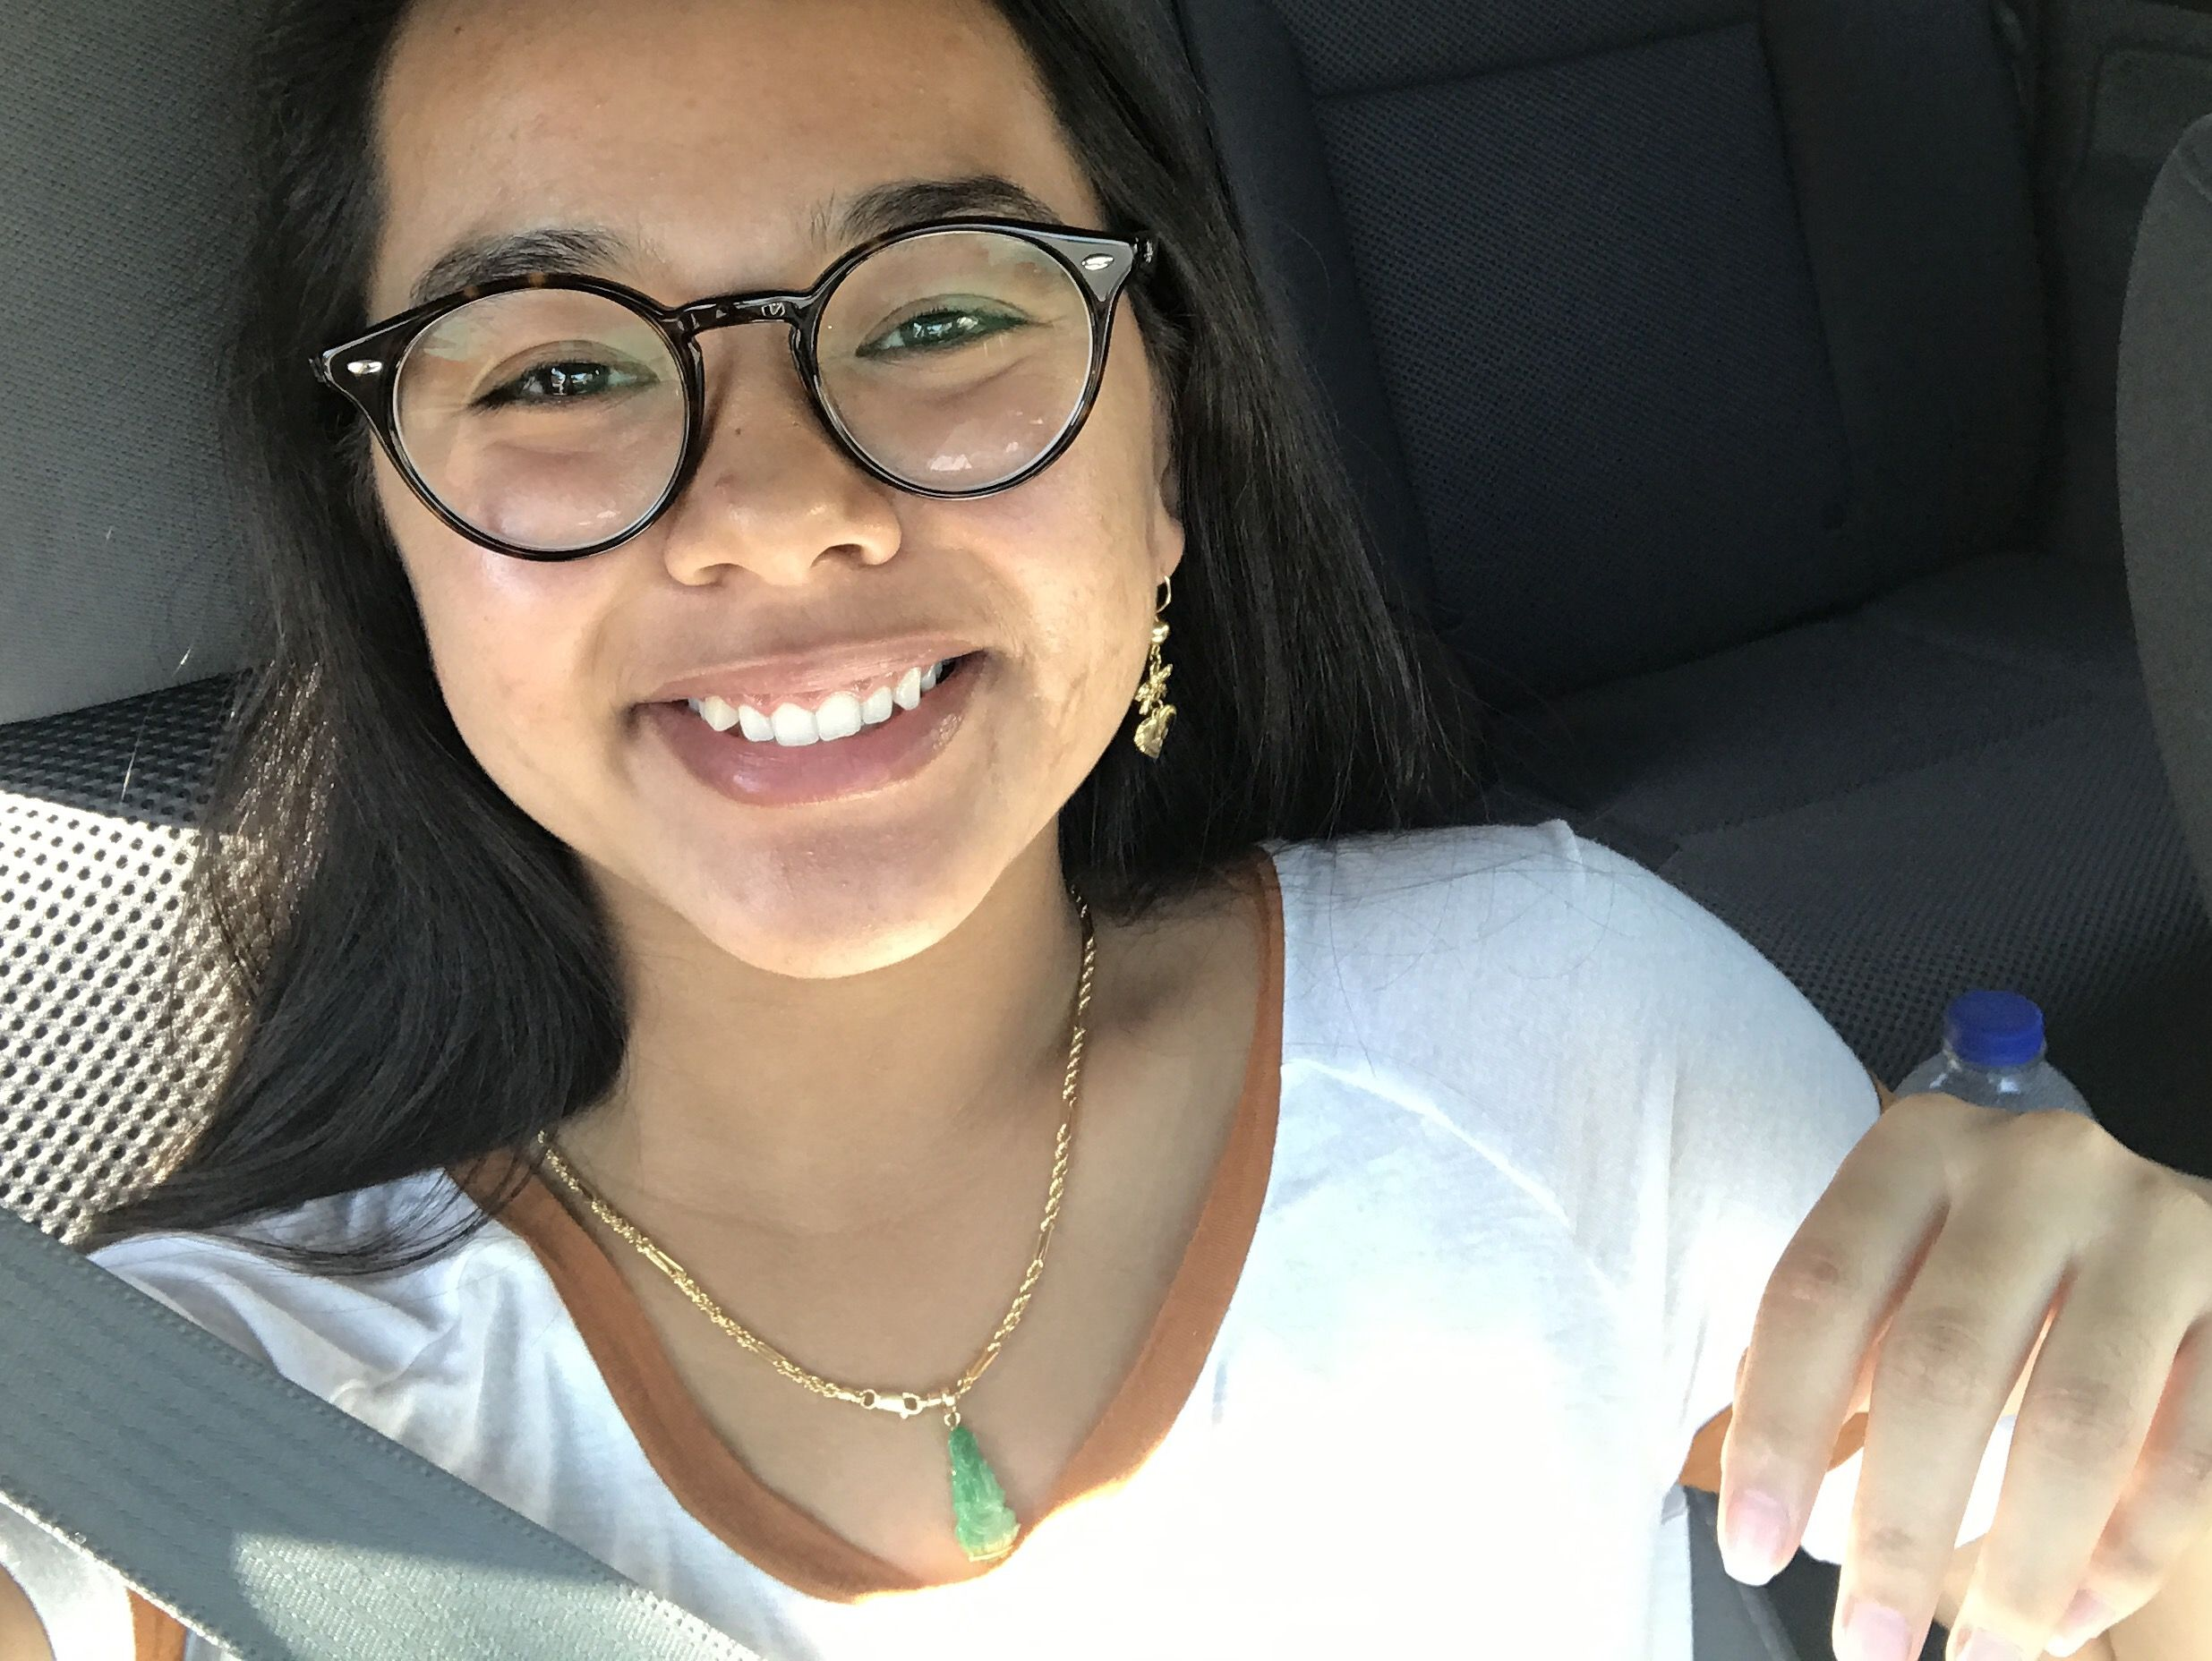 41806a7c77 Sunglasses · Eyeglasses · Ray Ban 2180v Wearing Glasses